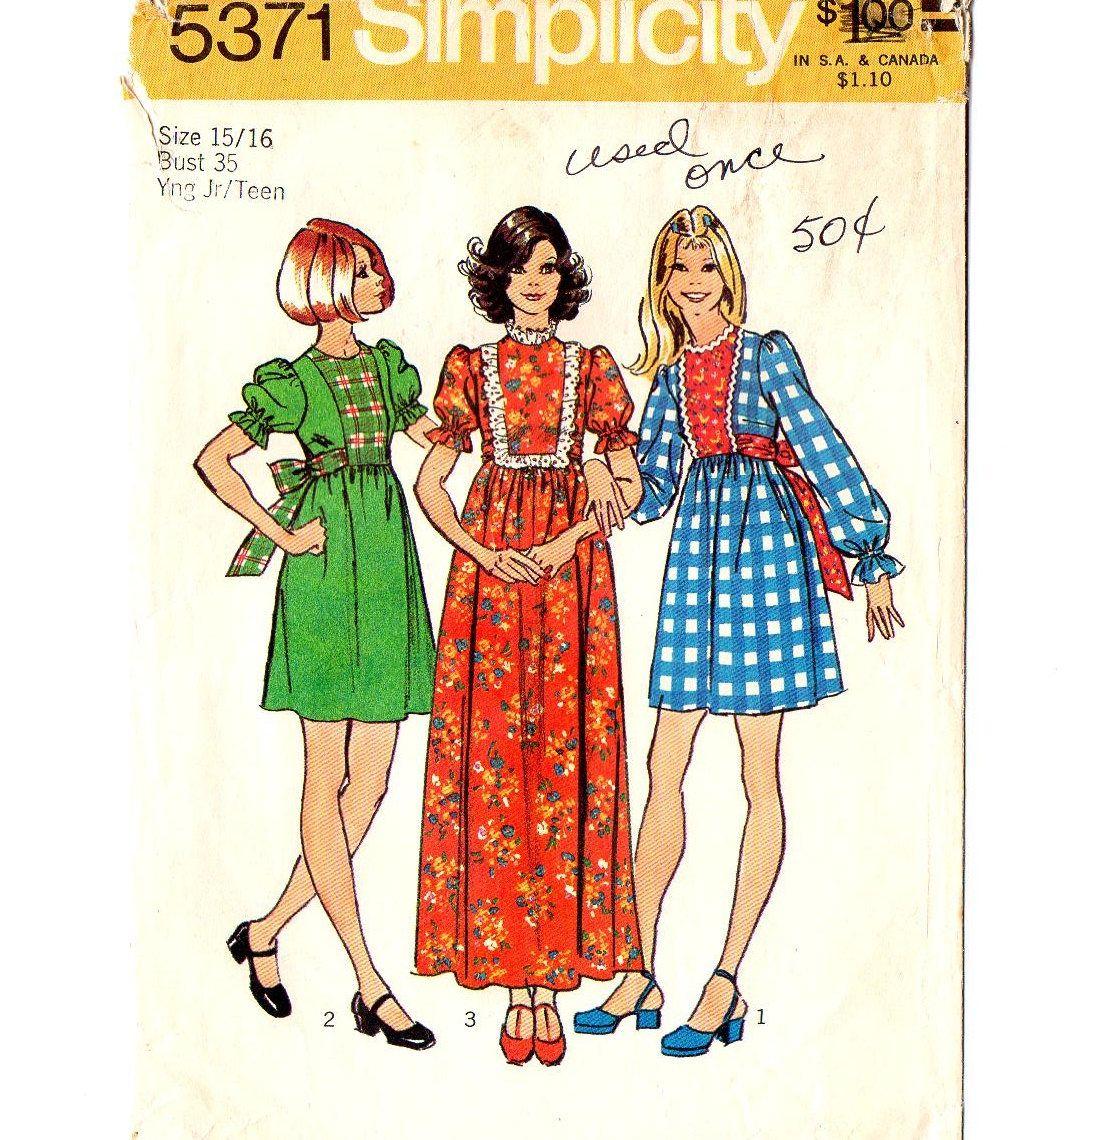 Simplicity 5371 Miss Mini Maxi Dress 70s Vintage Sewing Etsy Vintage Sewing Patterns Retro Fashion Vintage Vintage Sewing [ 1140 x 1107 Pixel ]